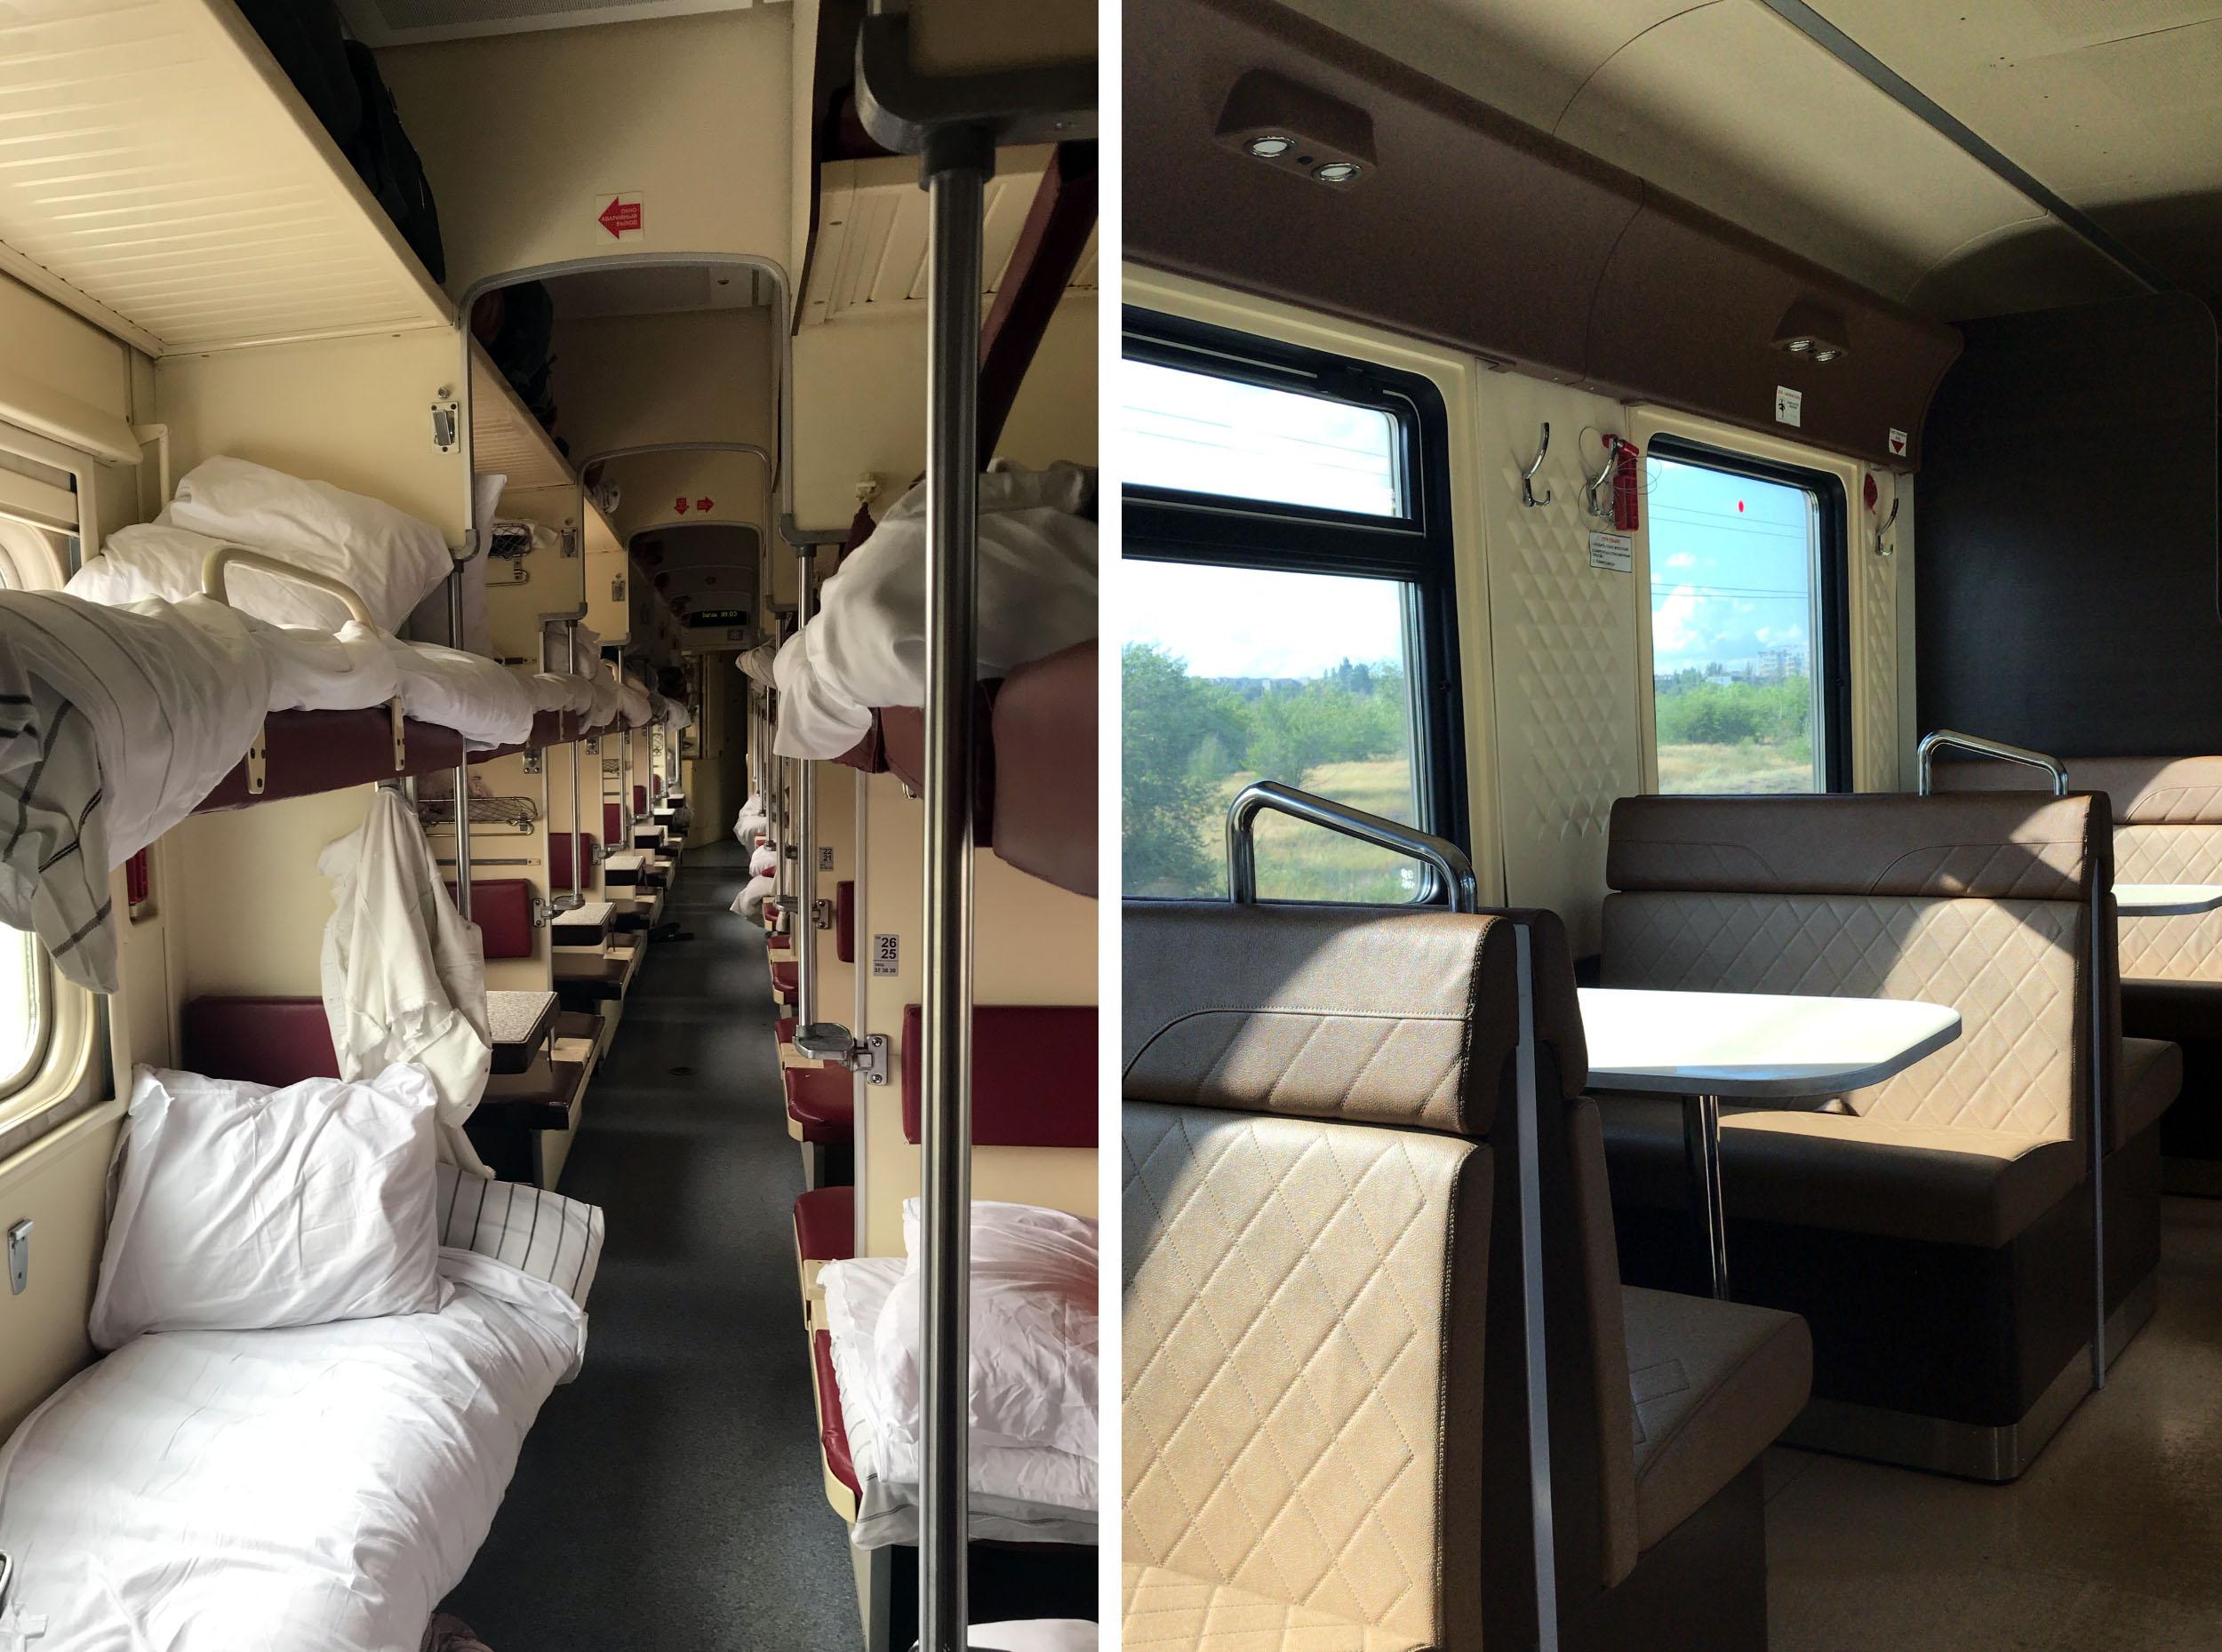 Third Class Sleeper Train in Russia